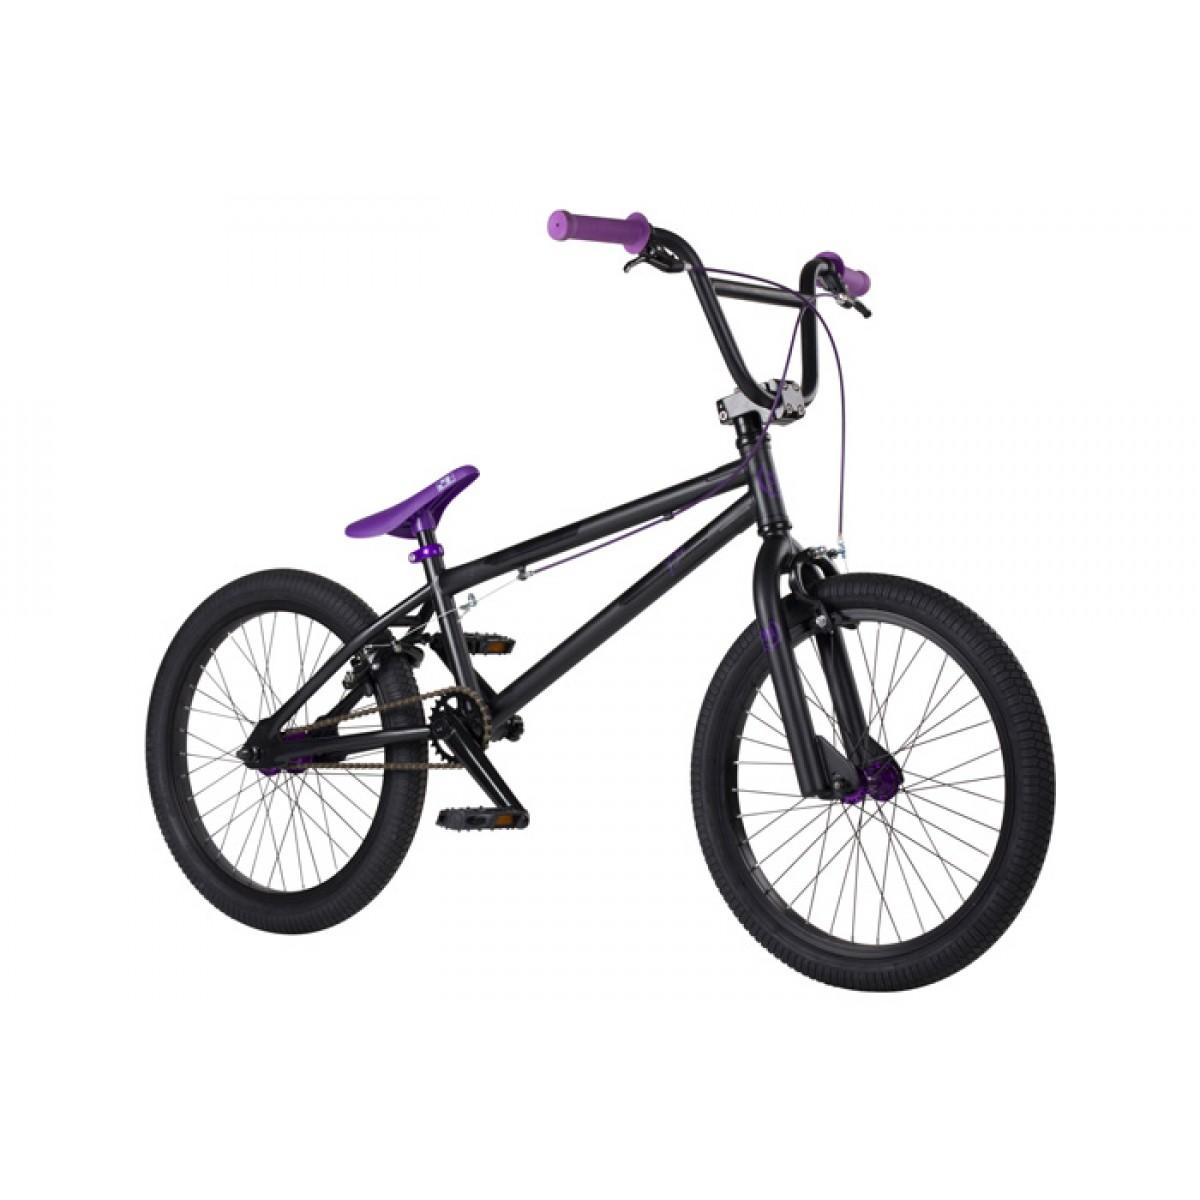 Cuda 25 Nine Freestyle Stunt BMX Bike